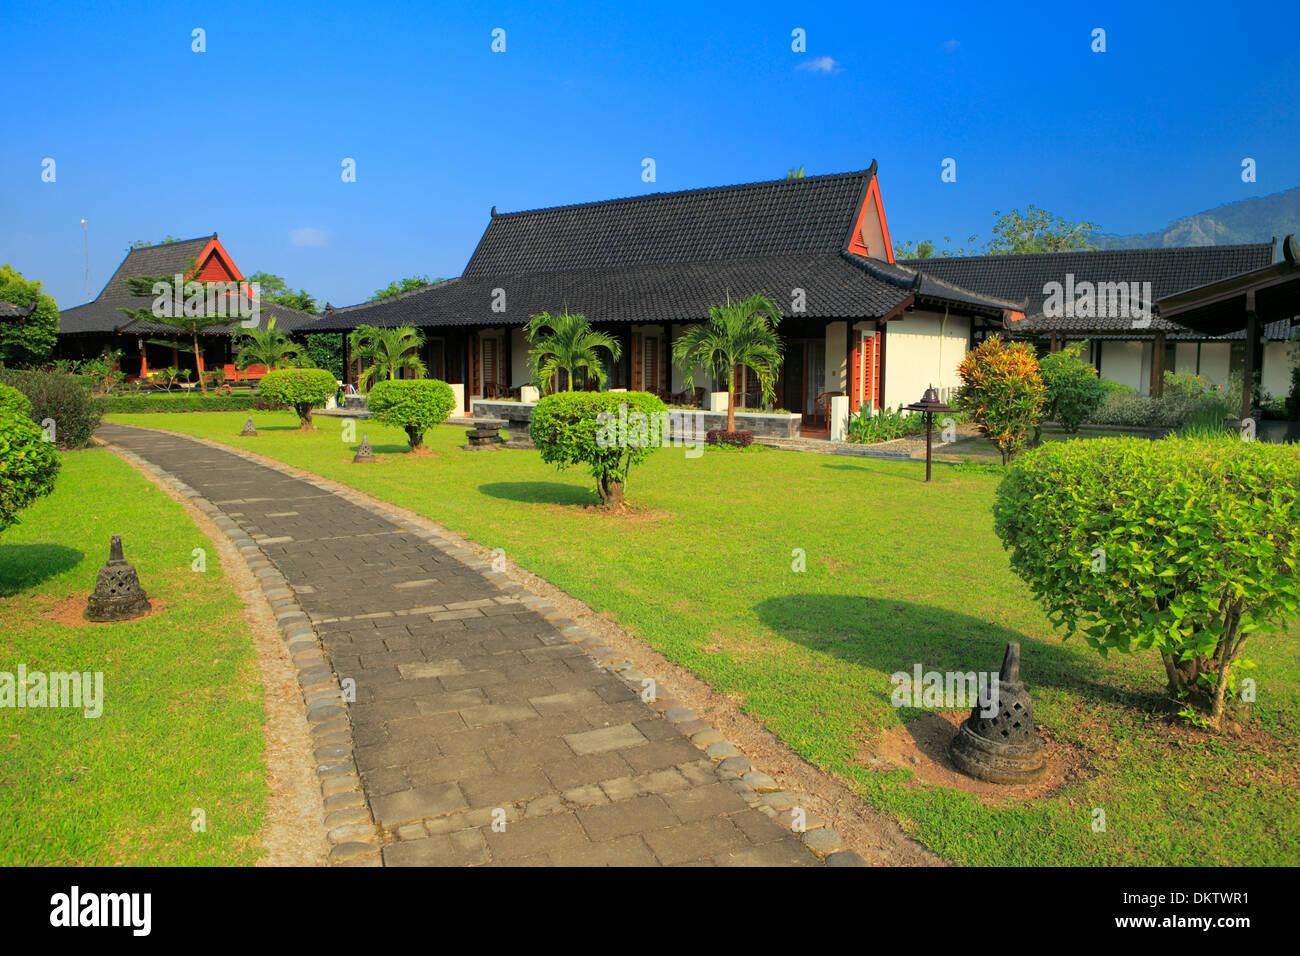 Top 10 Borobudur Hotels Near Borobudur Temple   Indonesia